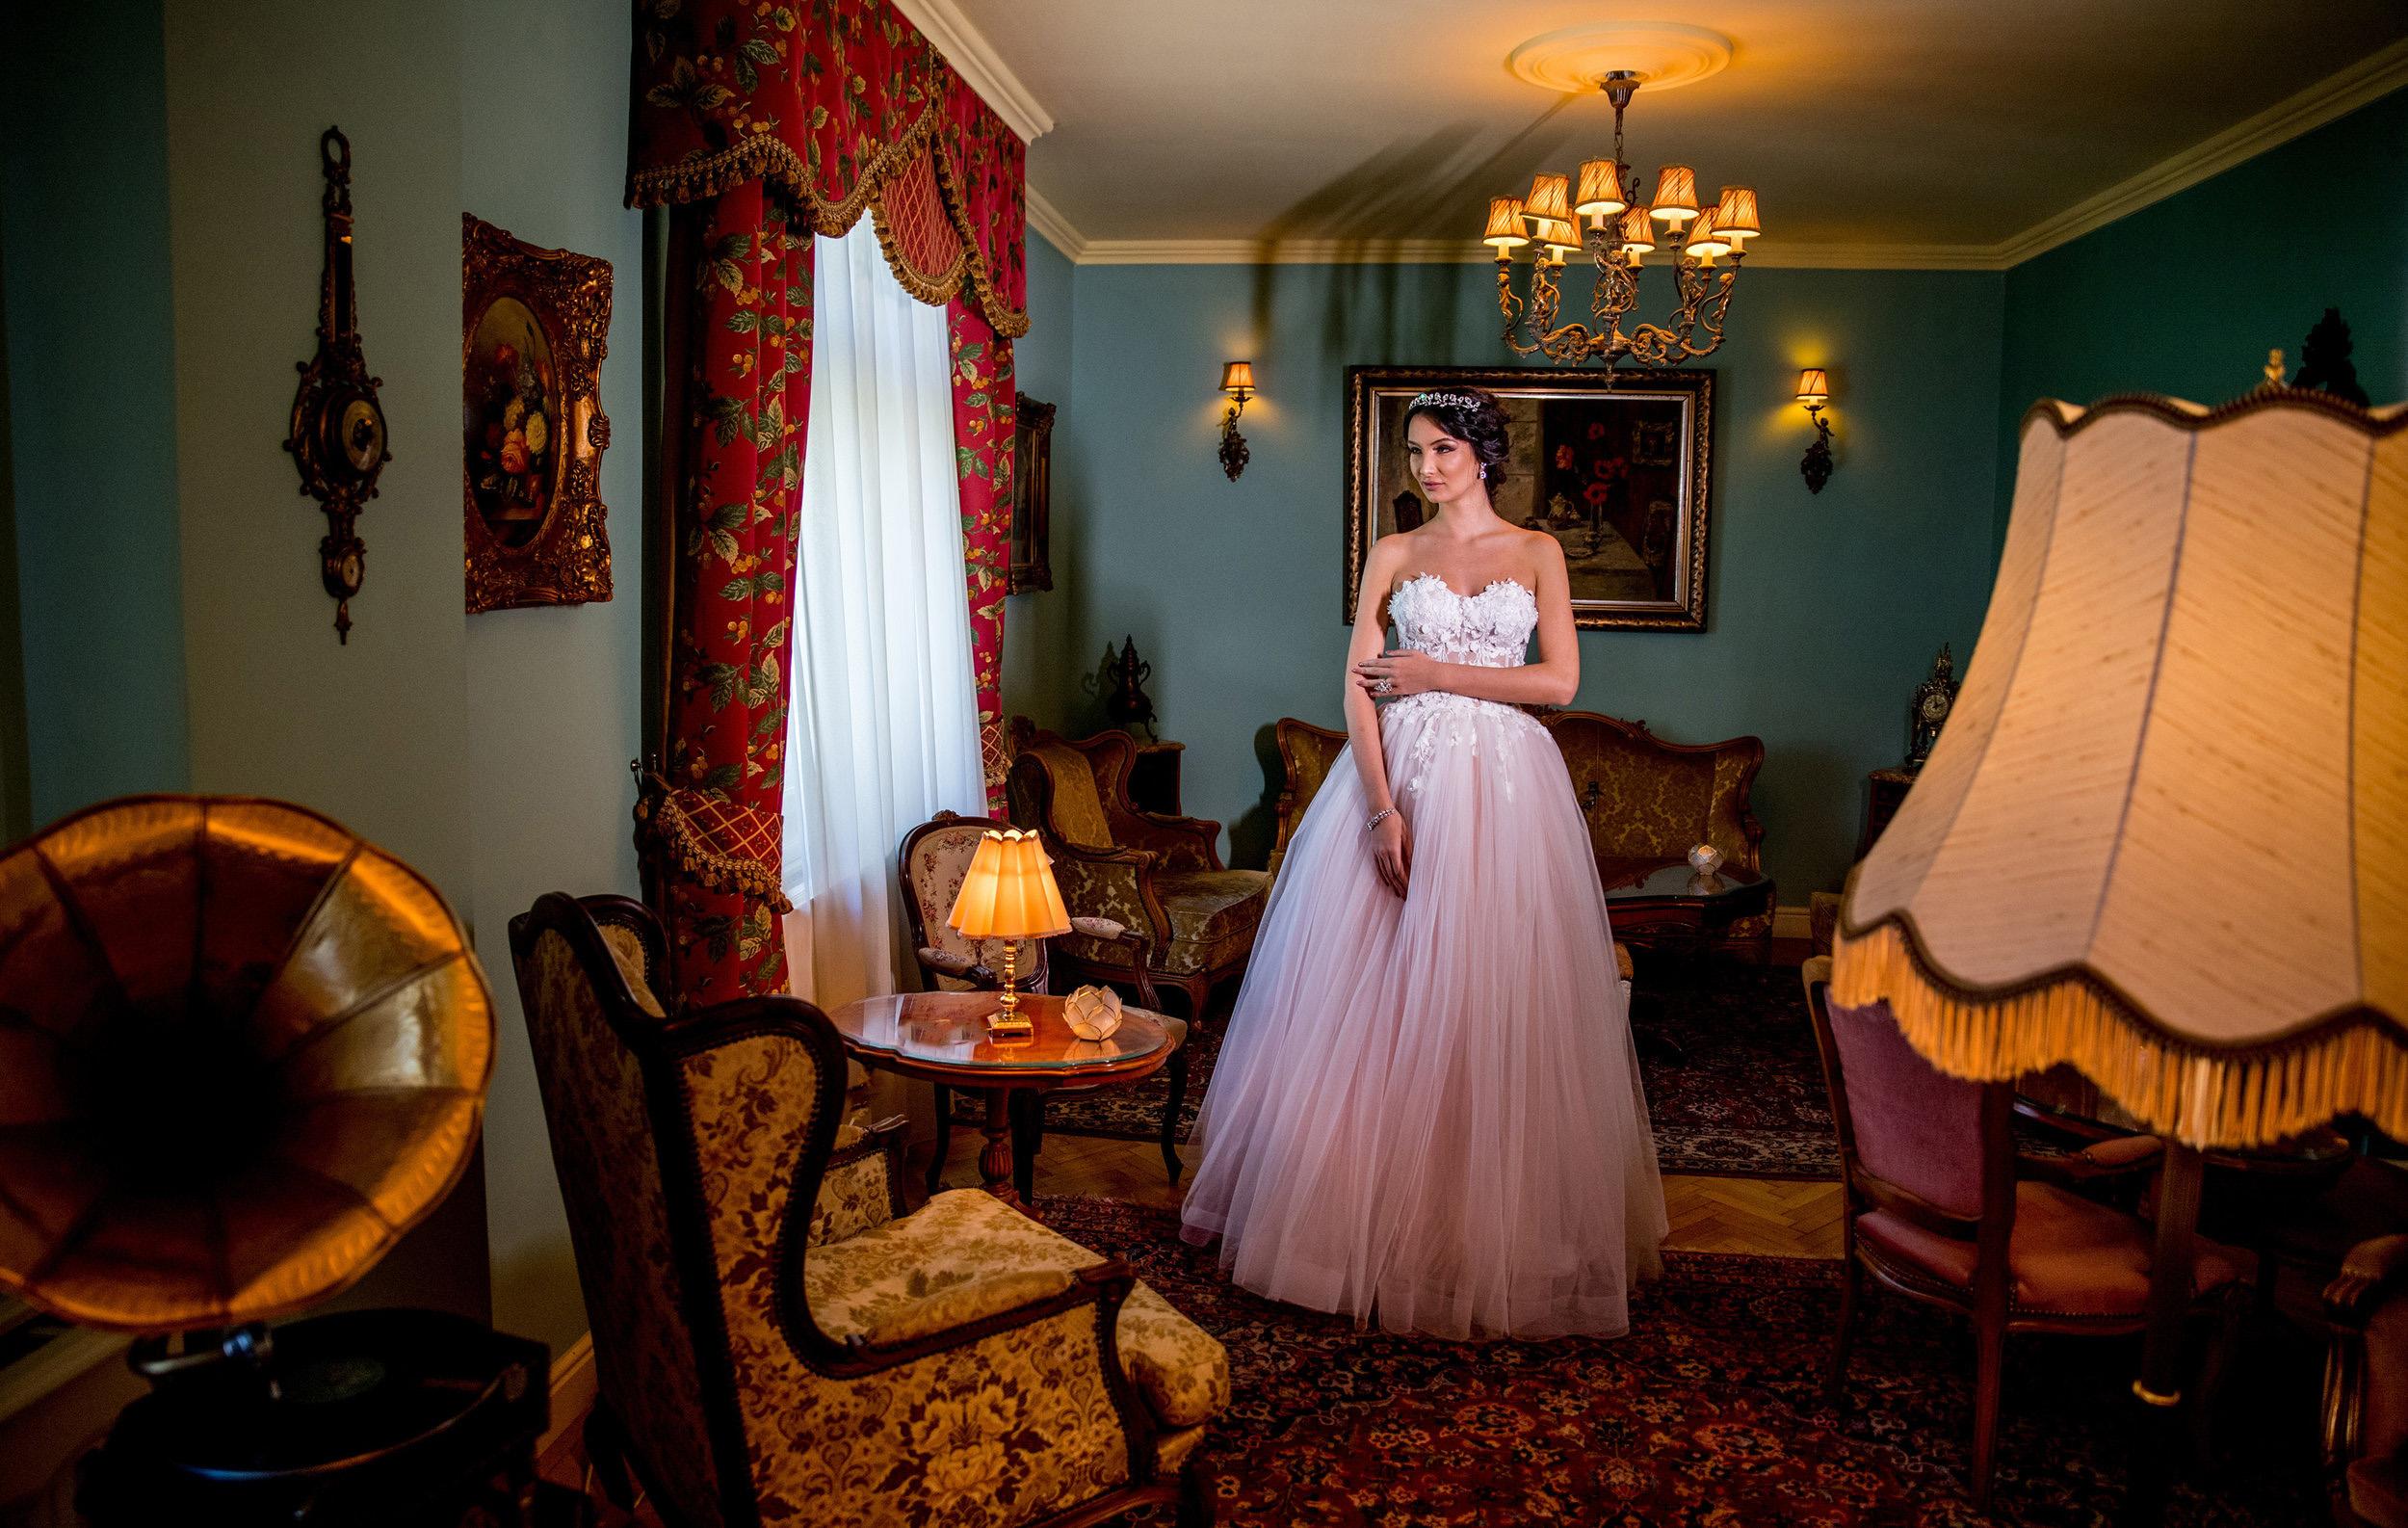 2018+Wedding+dress+Fashion+by+Laina+-+style+Balsamine-3.jpg